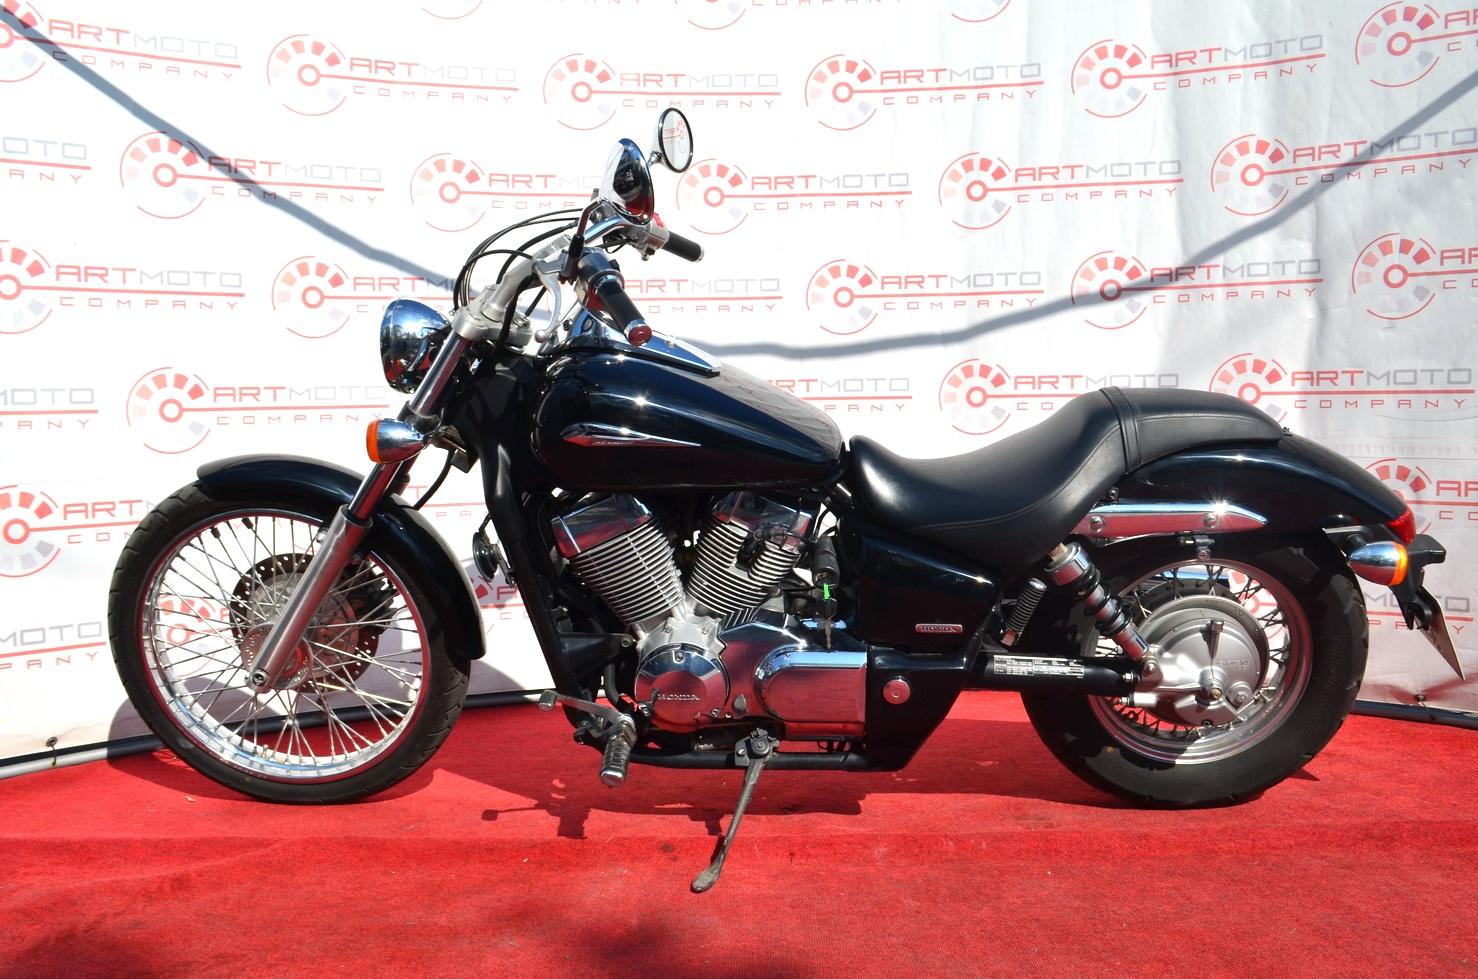 МОТОЦИКЛ HONDA VT750 SHADOW SPIRIT  Артмото - купить квадроцикл в украине и харькове, мотоцикл, снегоход, скутер, мопед, электромобиль